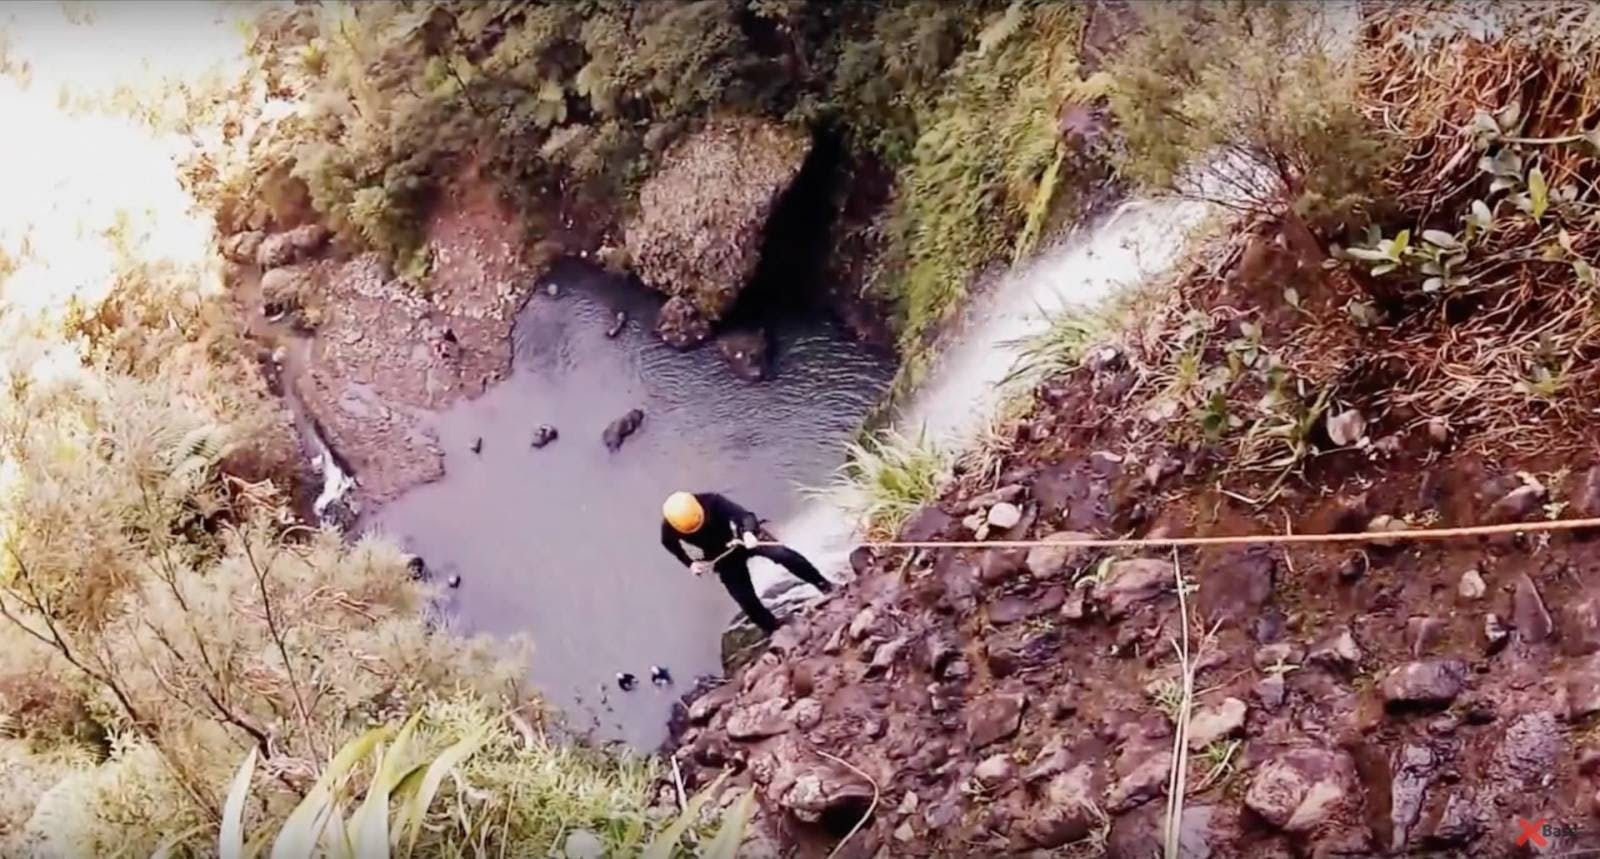 canyoning piha auckland awol canyoning adventures